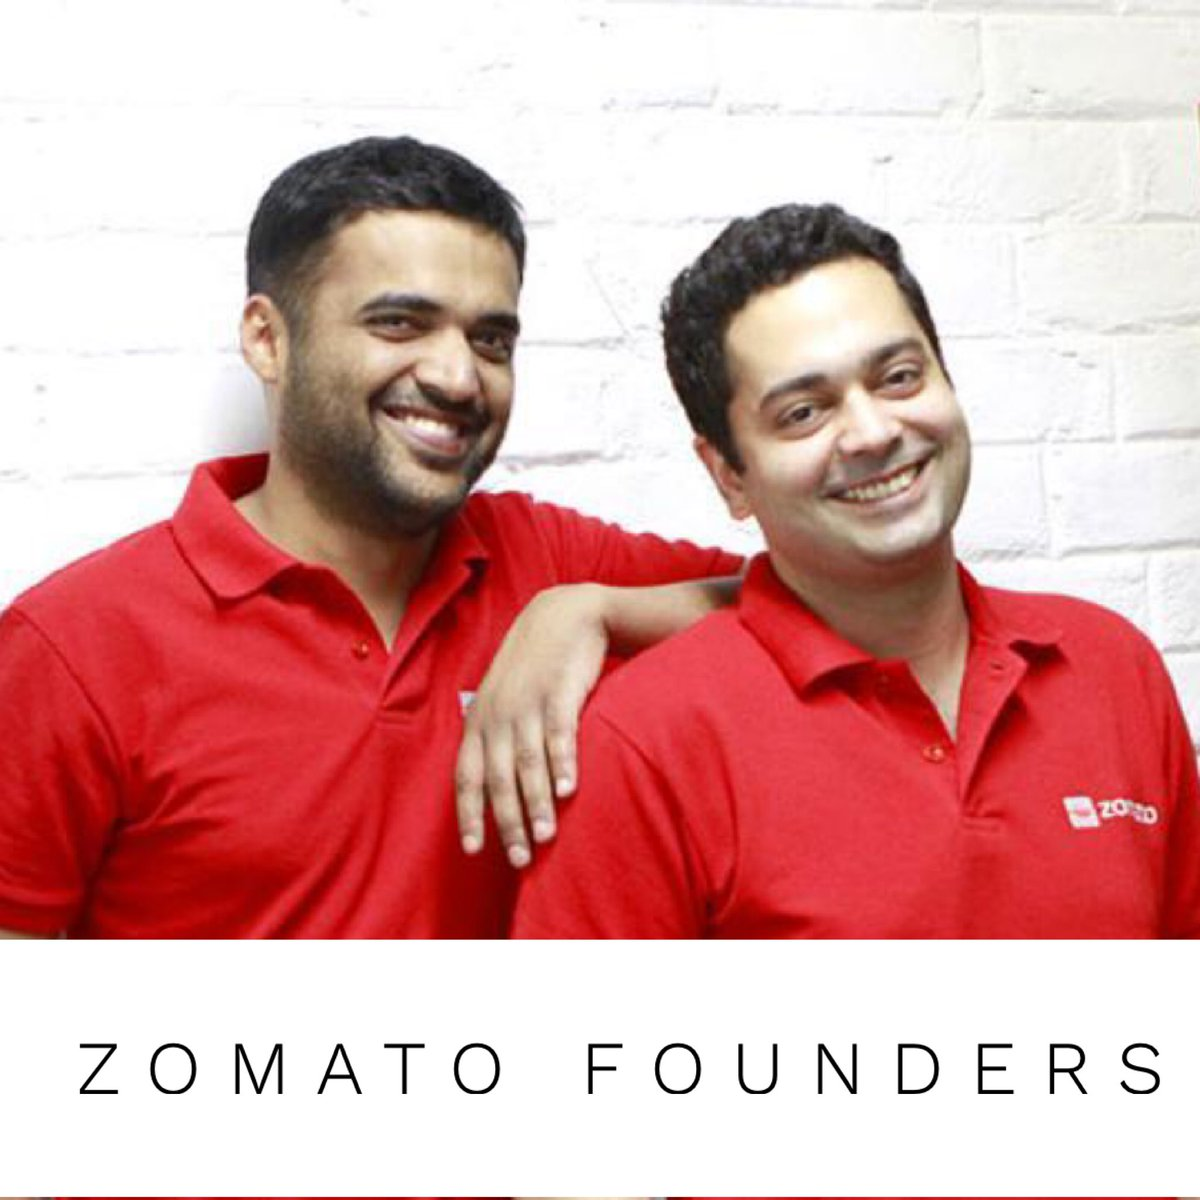 Zomato founders Deepinder Goyal and Pankaj Chaddah